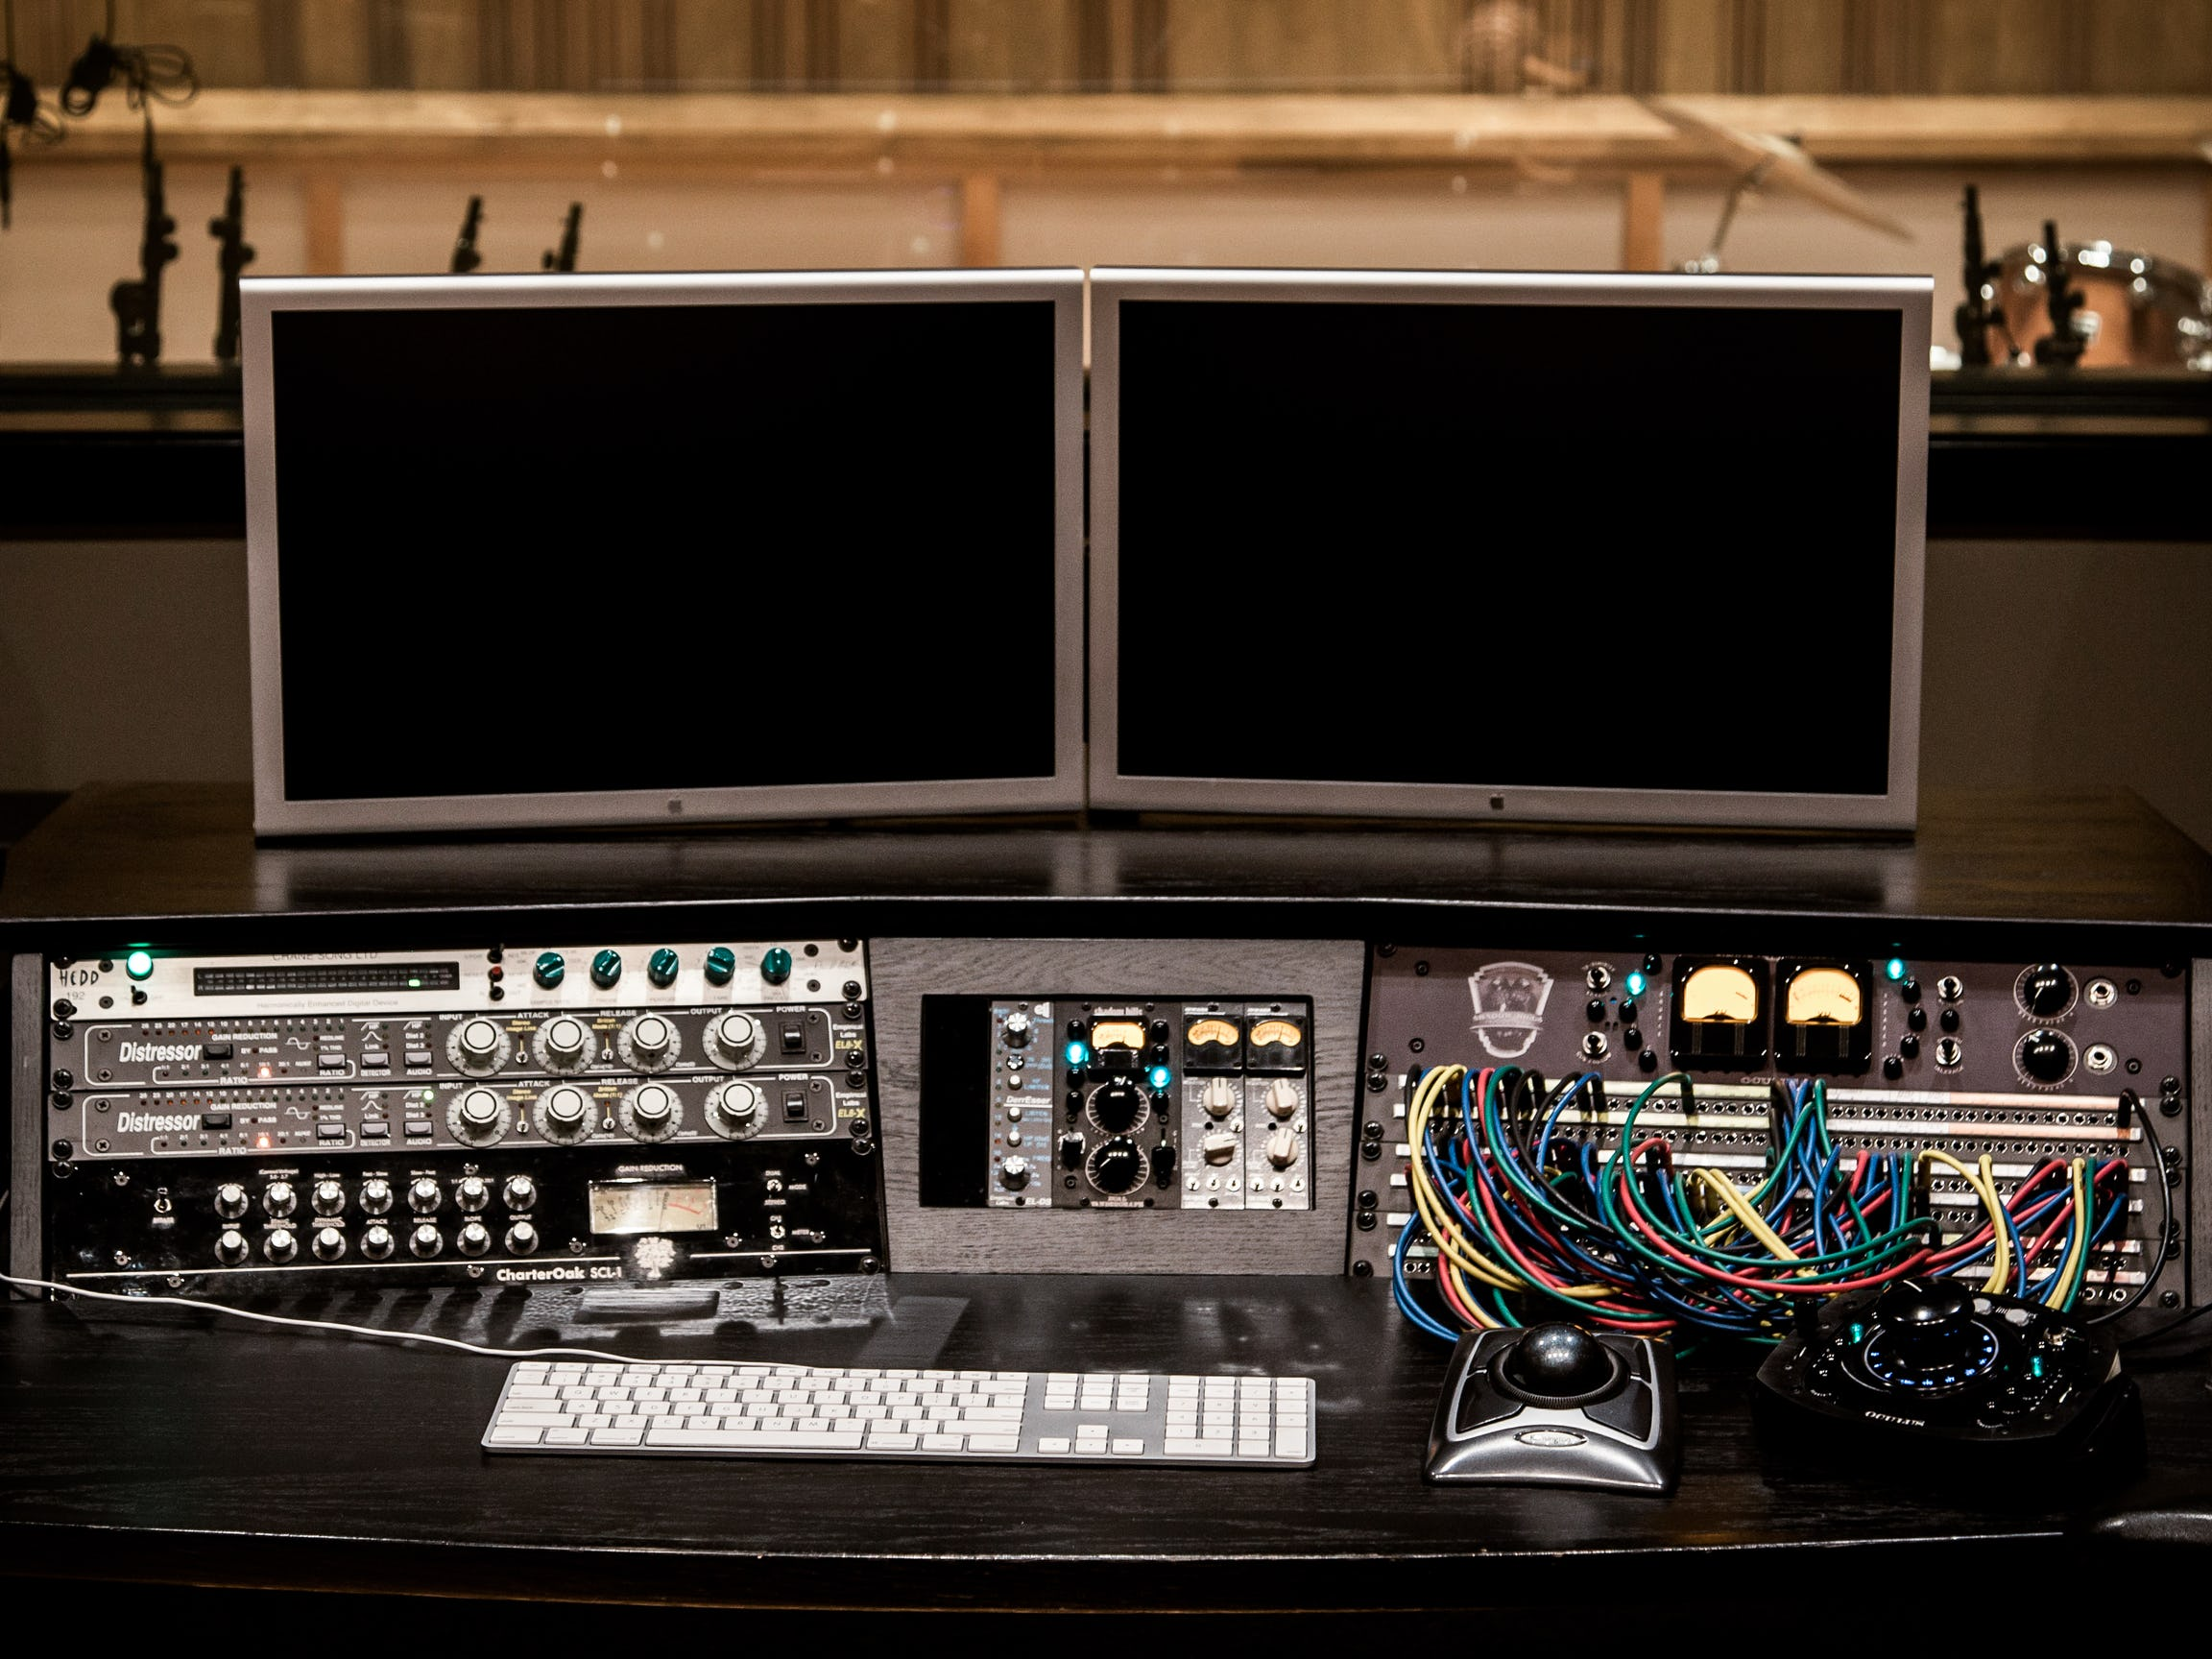 Nettleingham Audio Recording Studio Wiring Previous Next